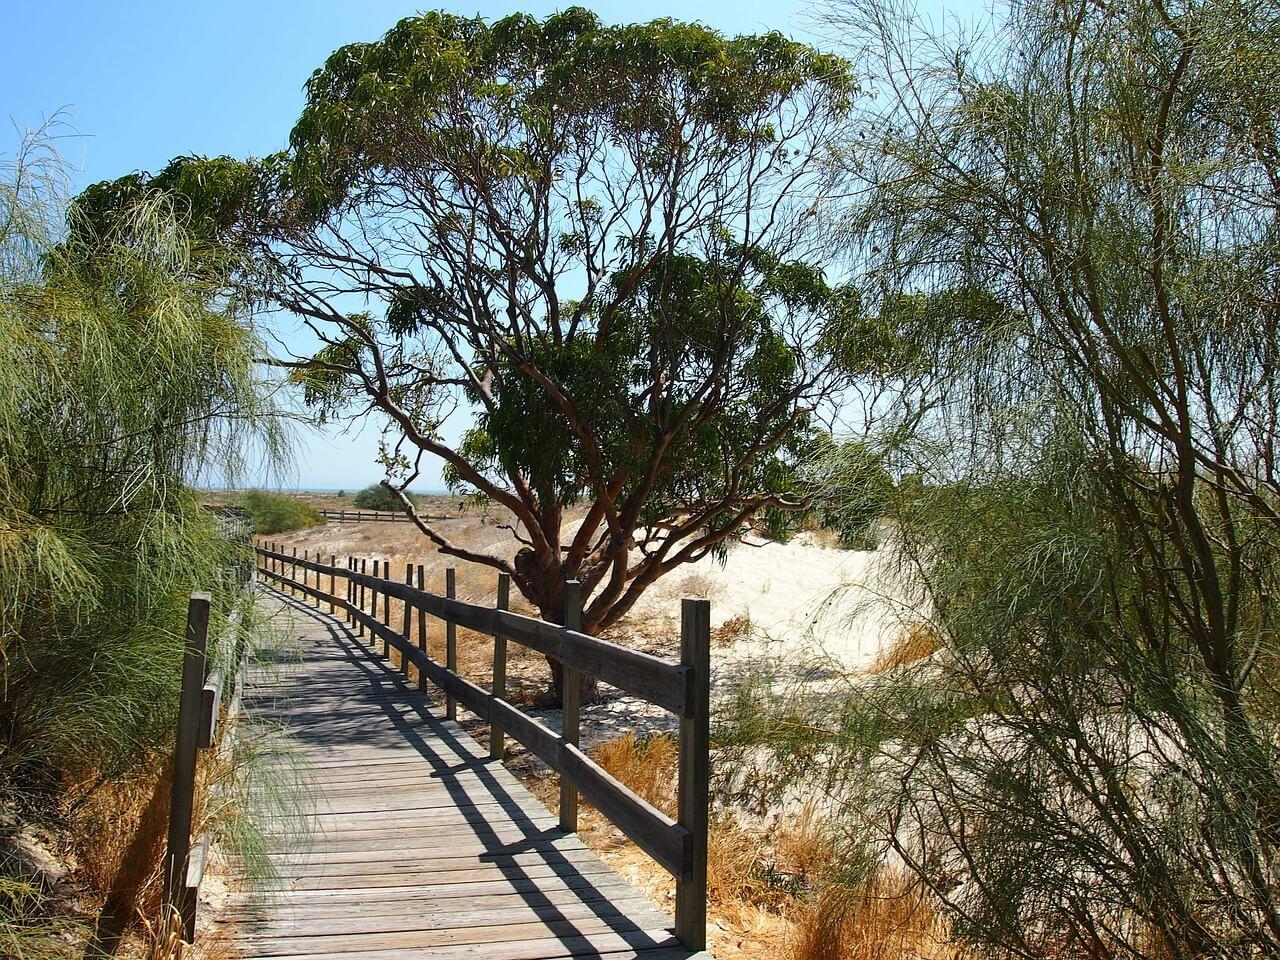 praia de troia roadtrip pela costa vicentina